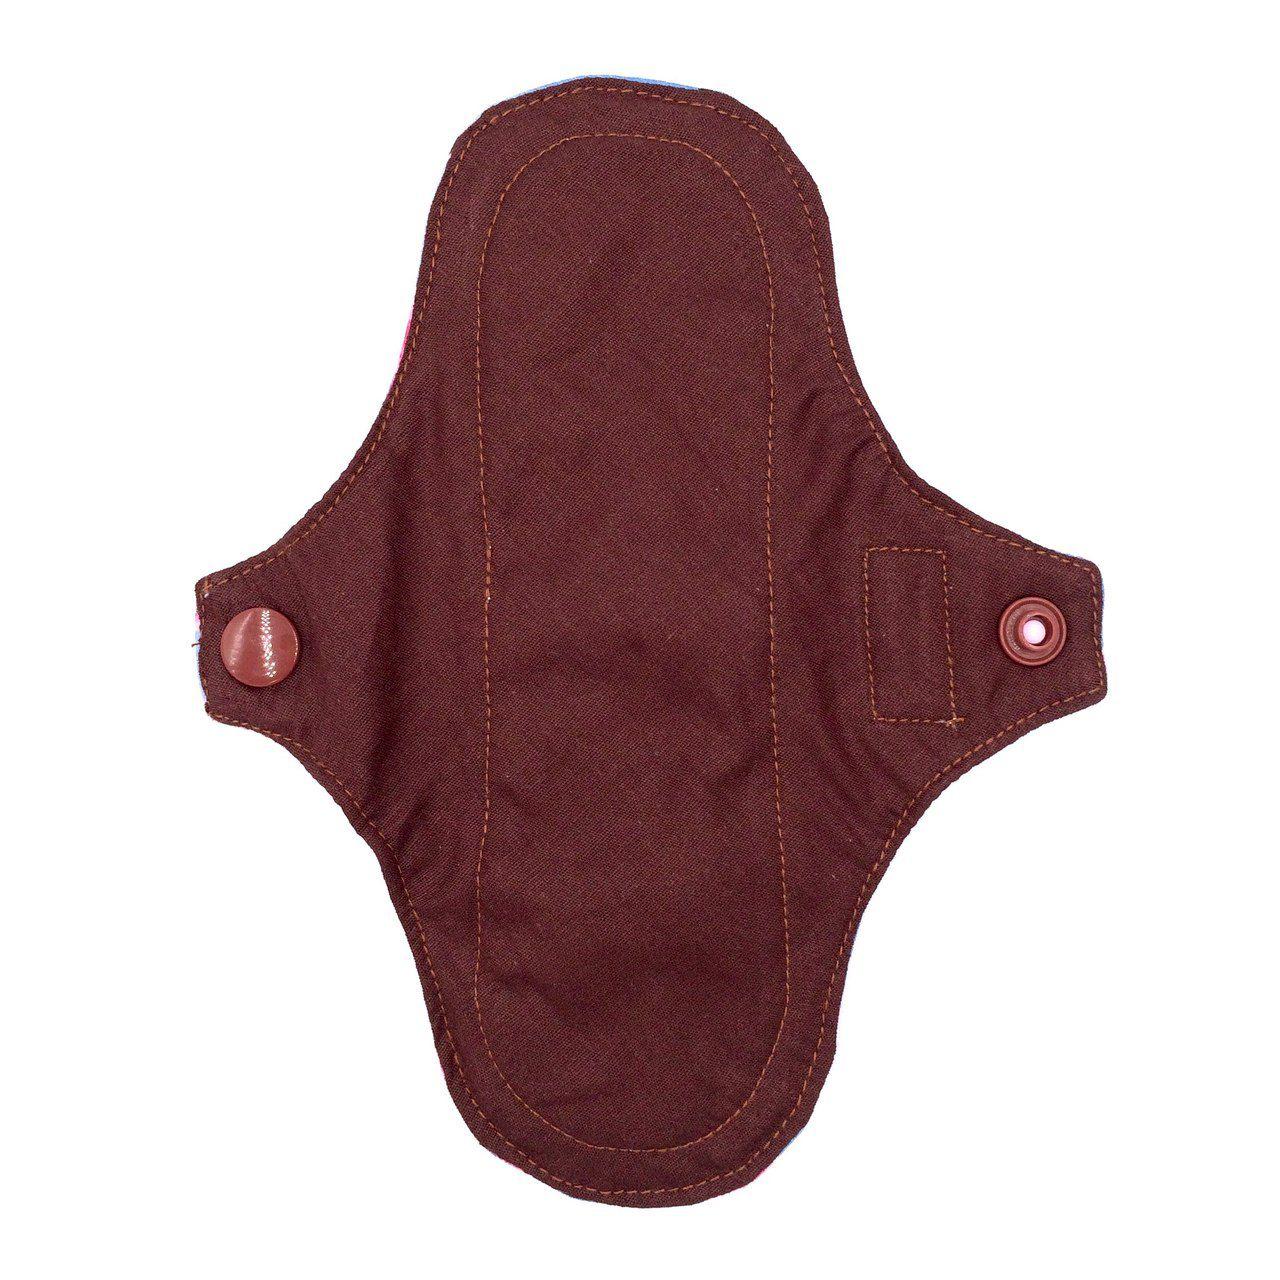 Kit Absorvente de Pano Korui Normal Conforto Natural + Bolsinha Impermeável